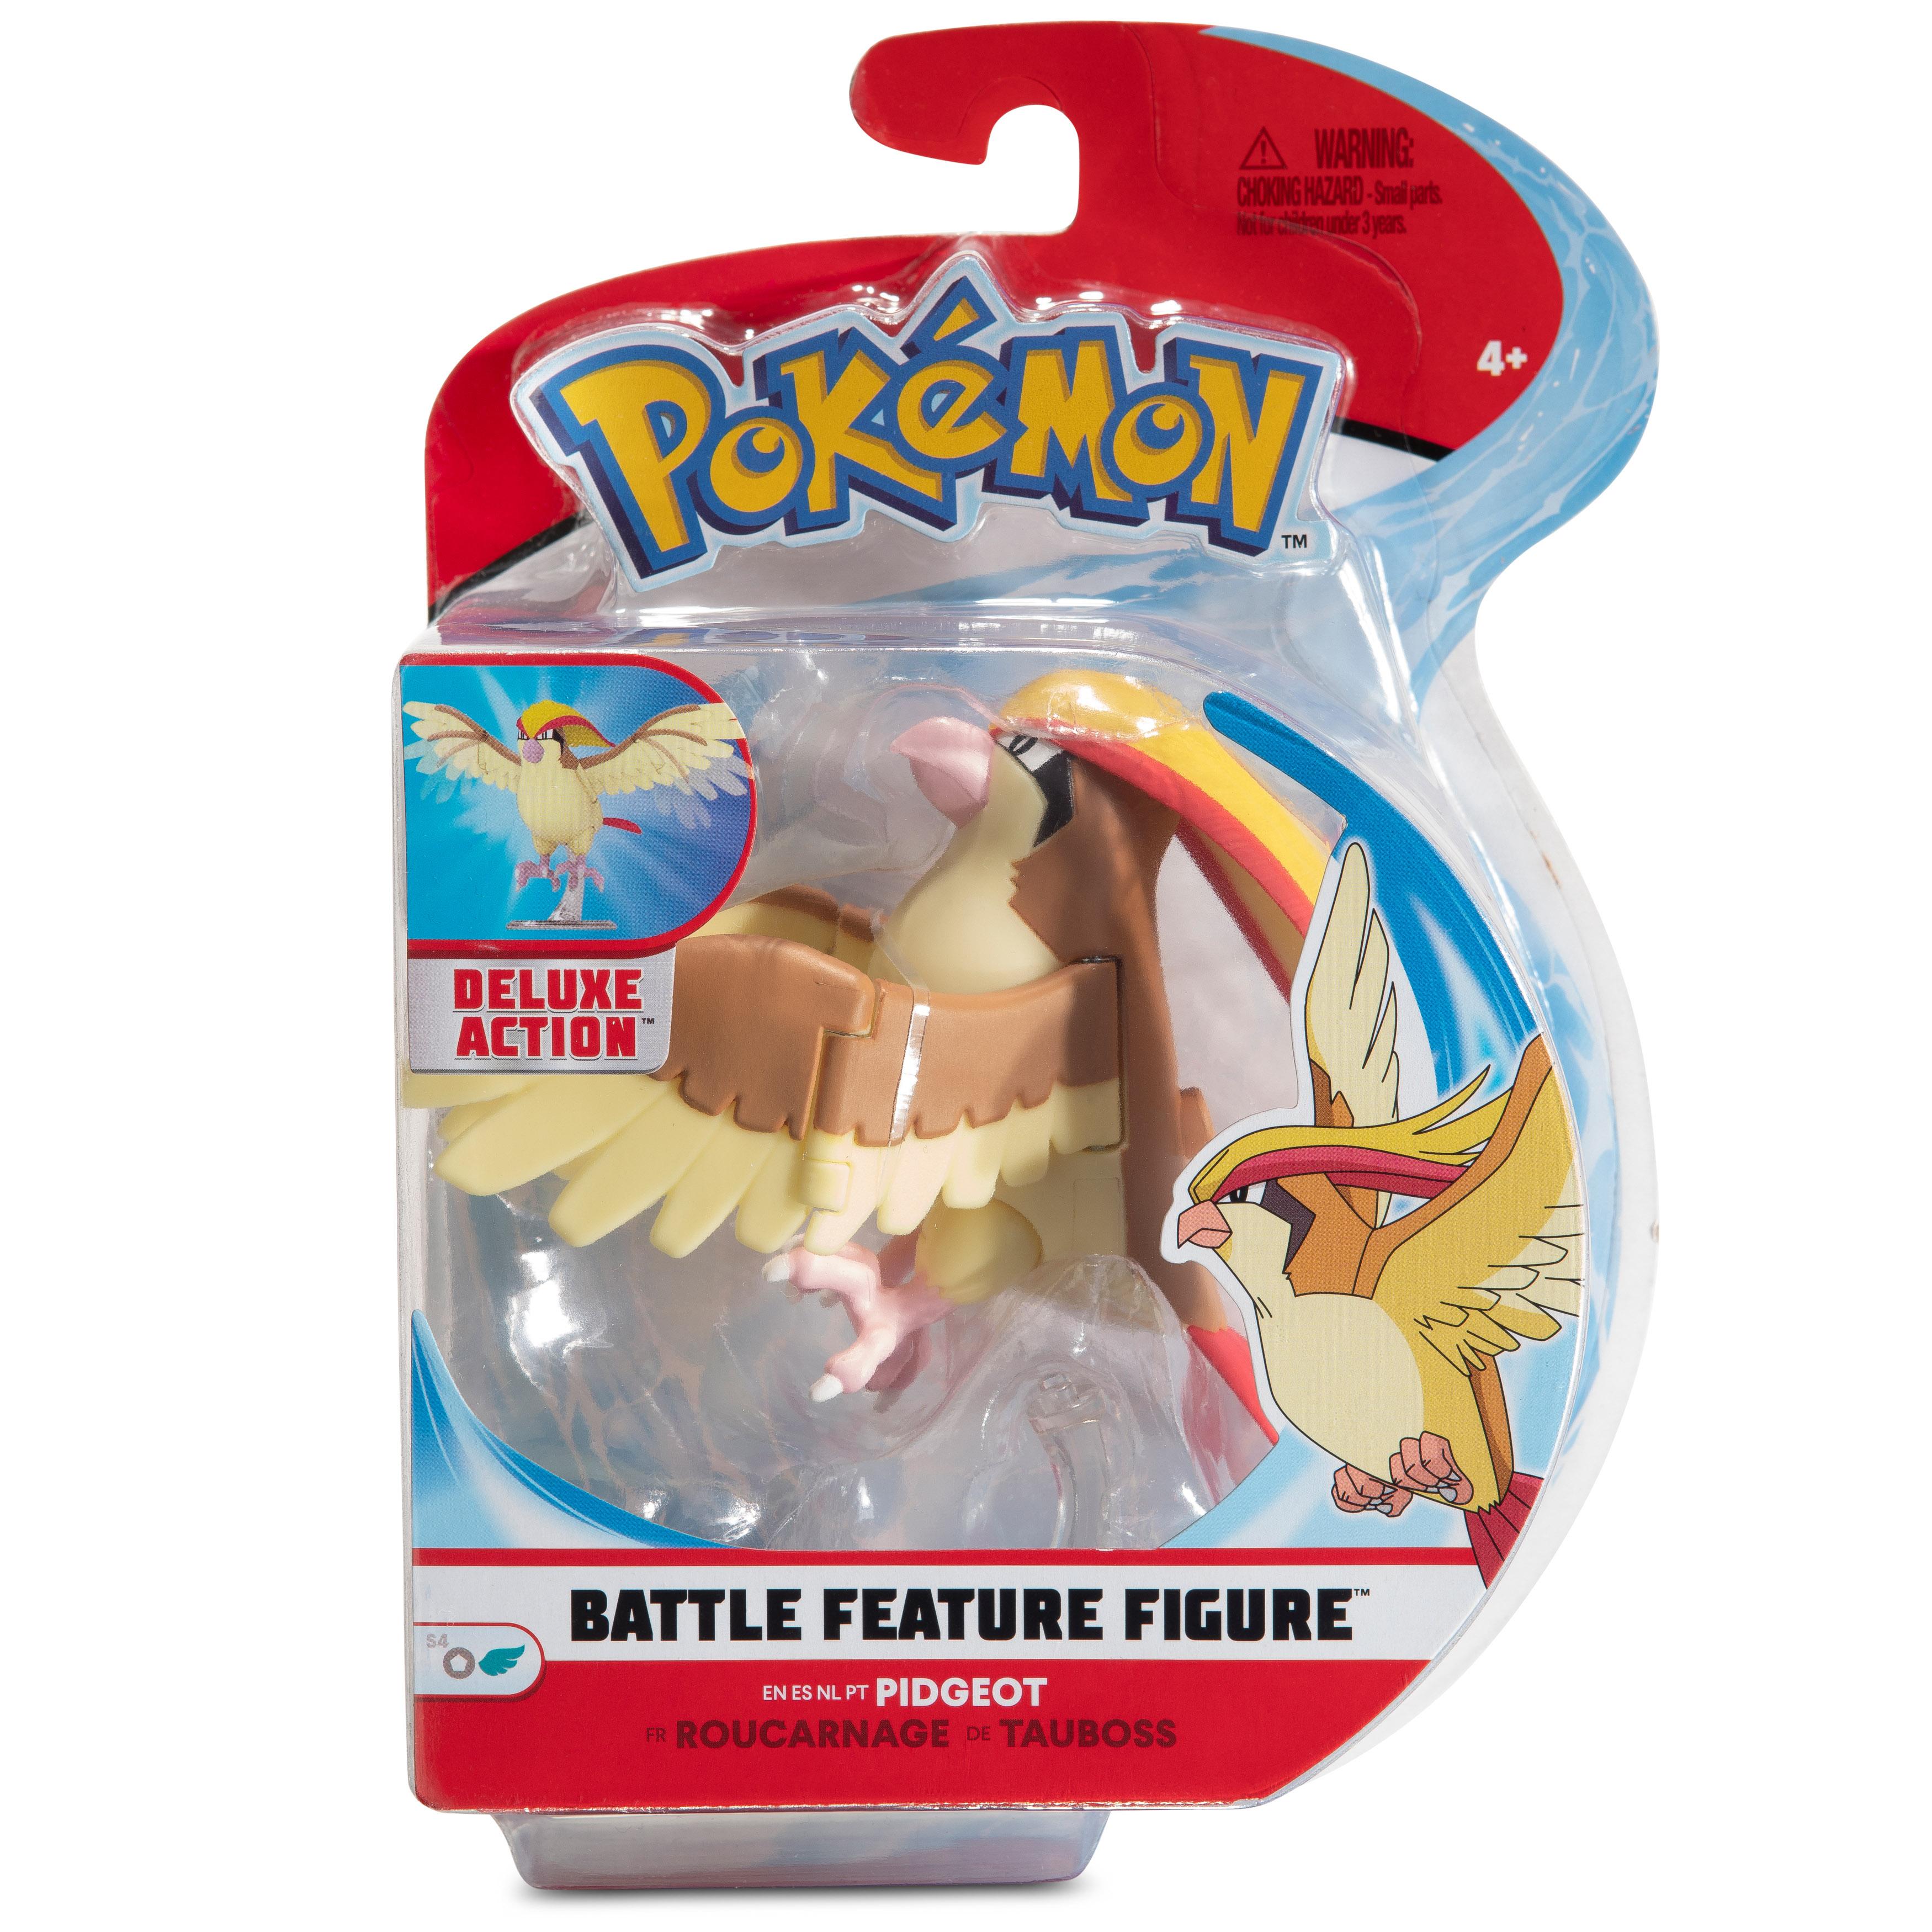 Pokémon - Battle Feature Figur - Tauboss